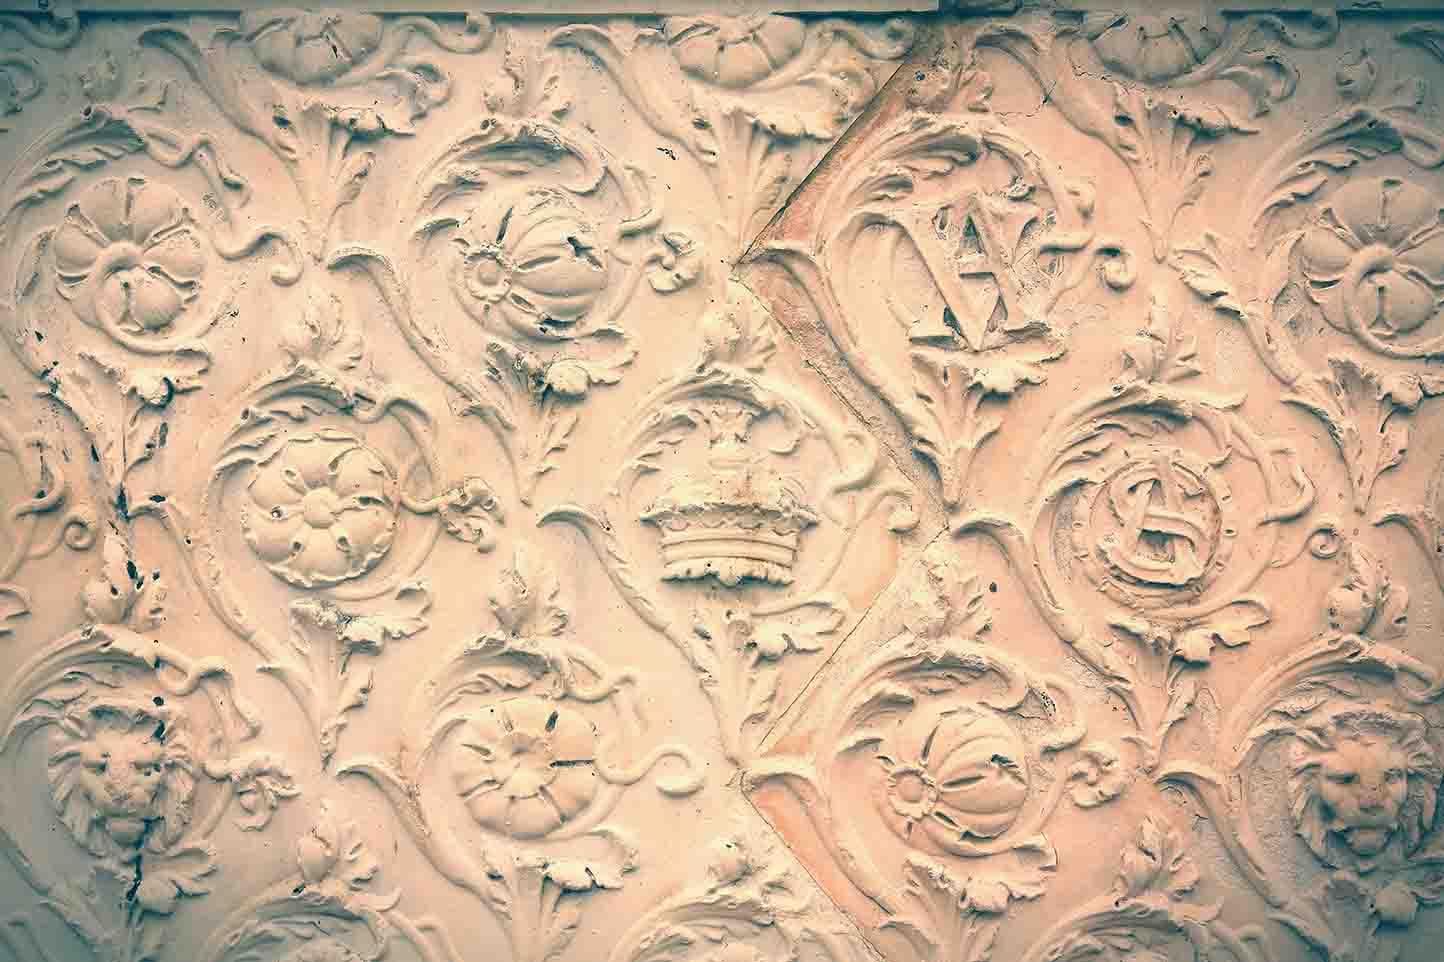 Texturizados de superfícies. Moda Vintage